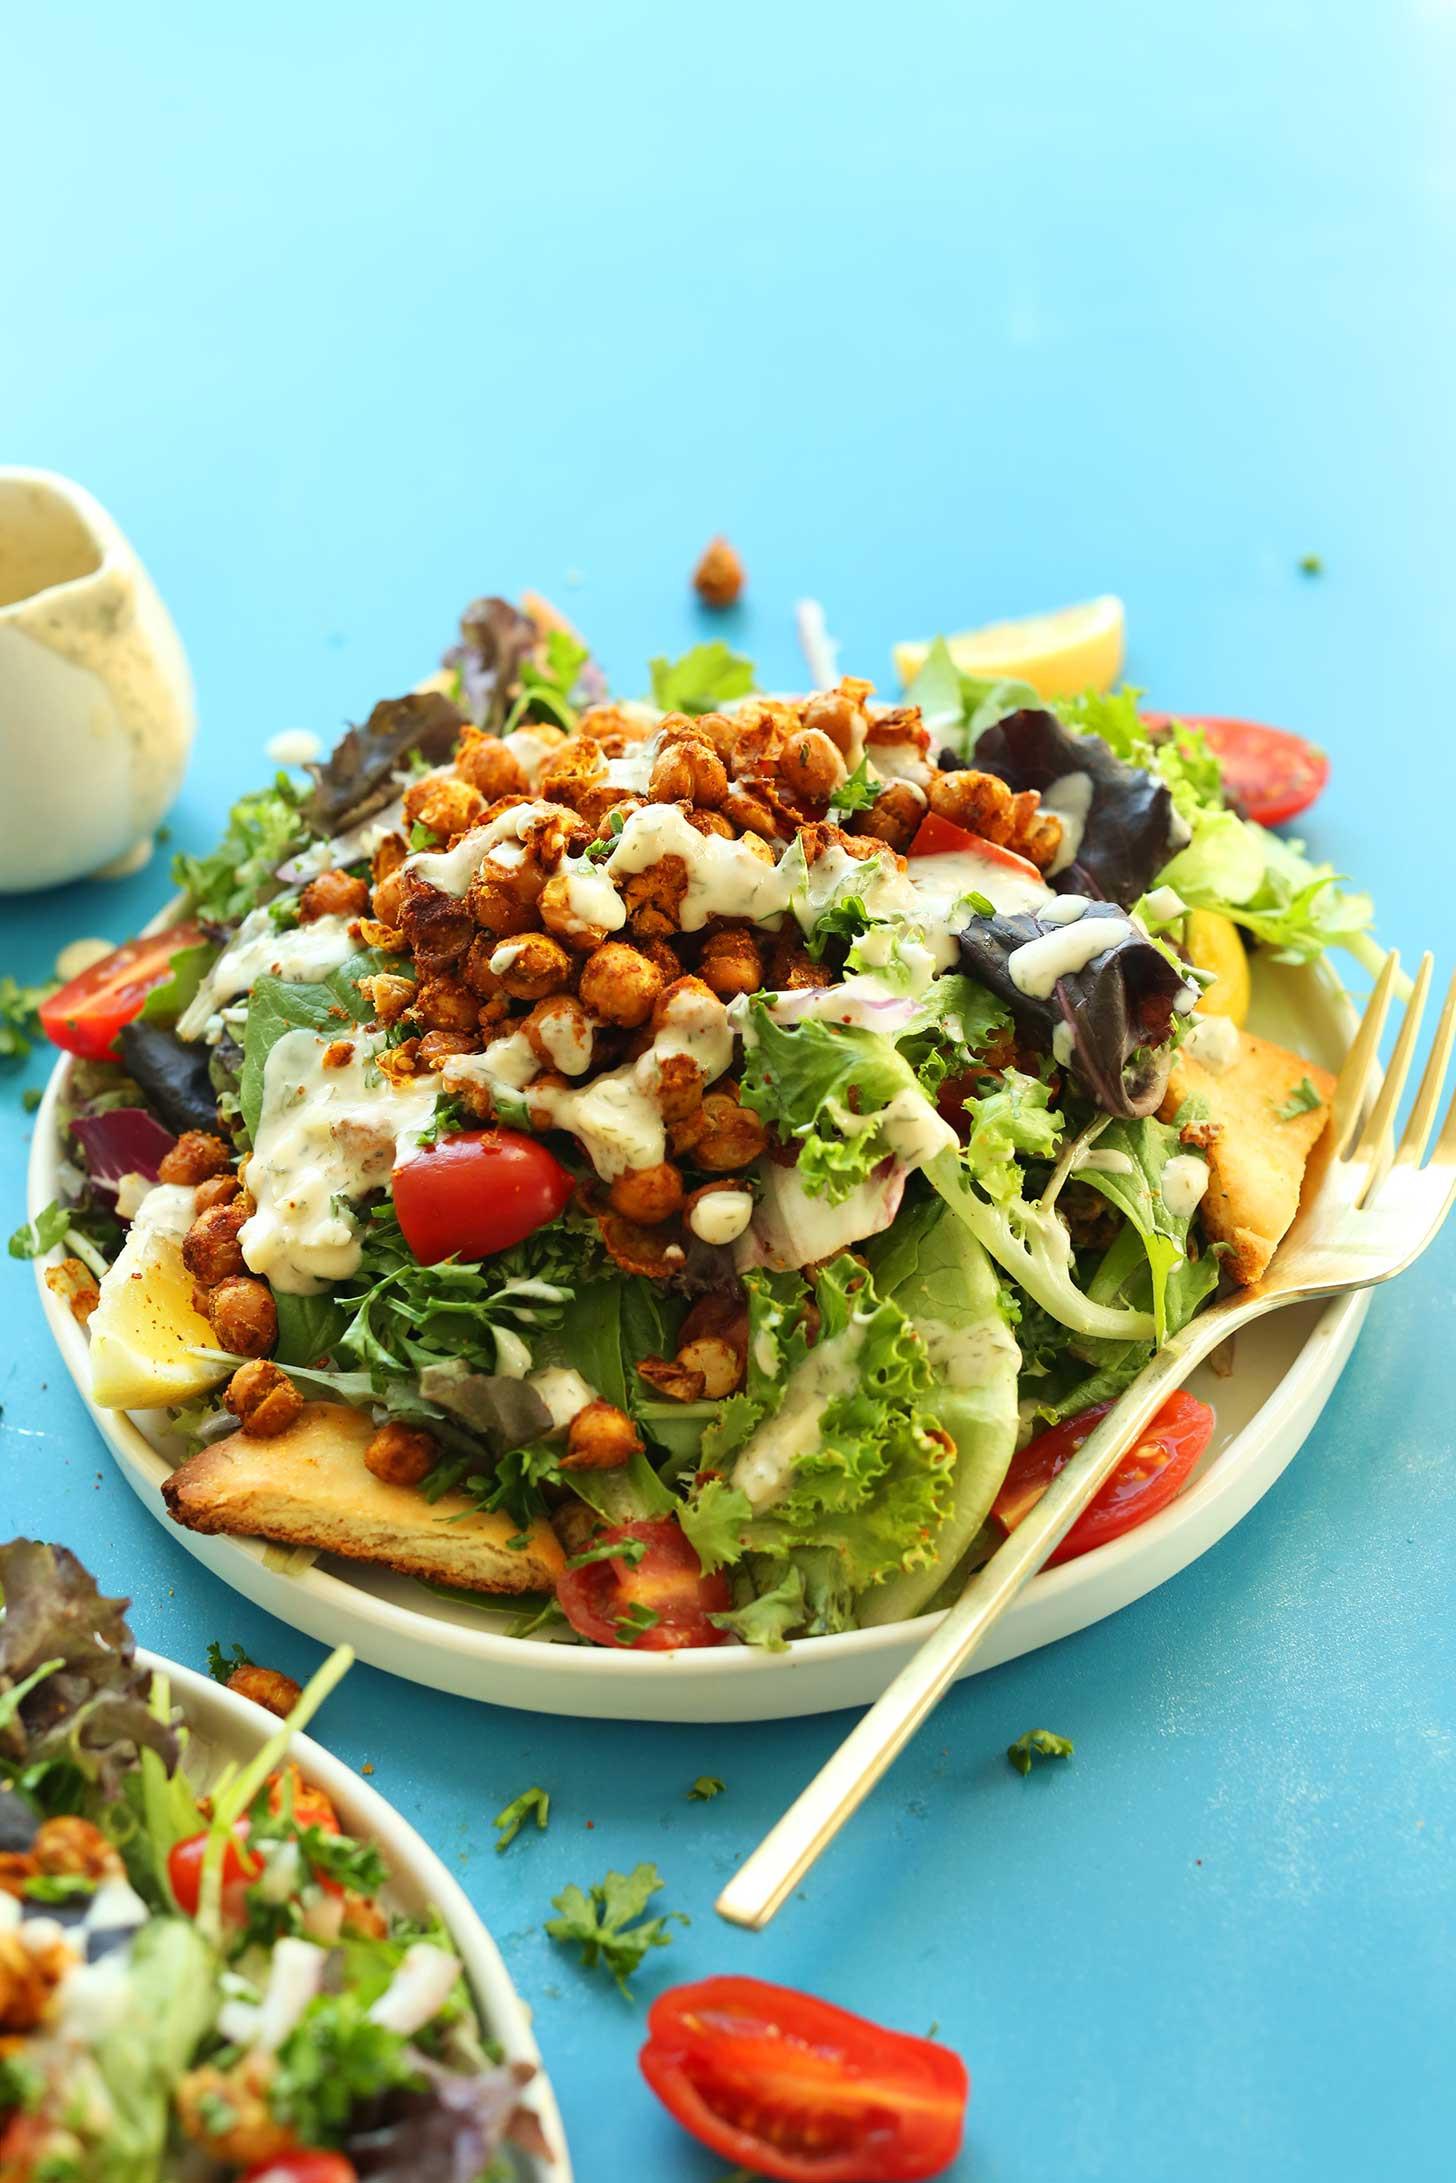 Healthy Salad Recipes For Dinner  Chickpea Shawarma Salad